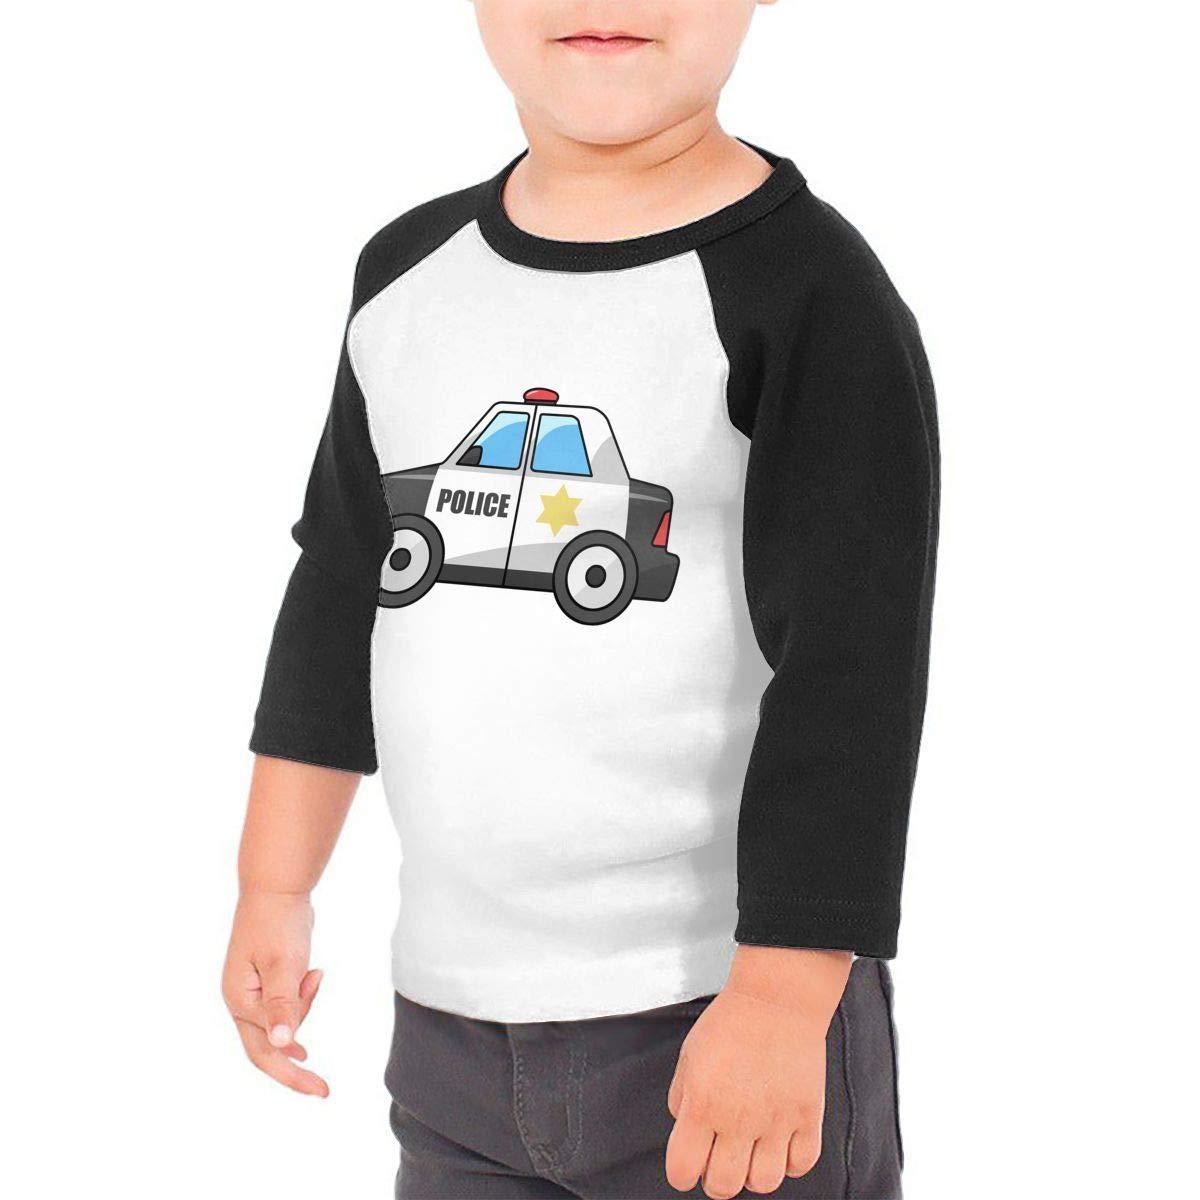 Kid's Boys& girls Police Car 3/4 Sleeve Raglan Tee Shirt For 2-6T Fillmore-M